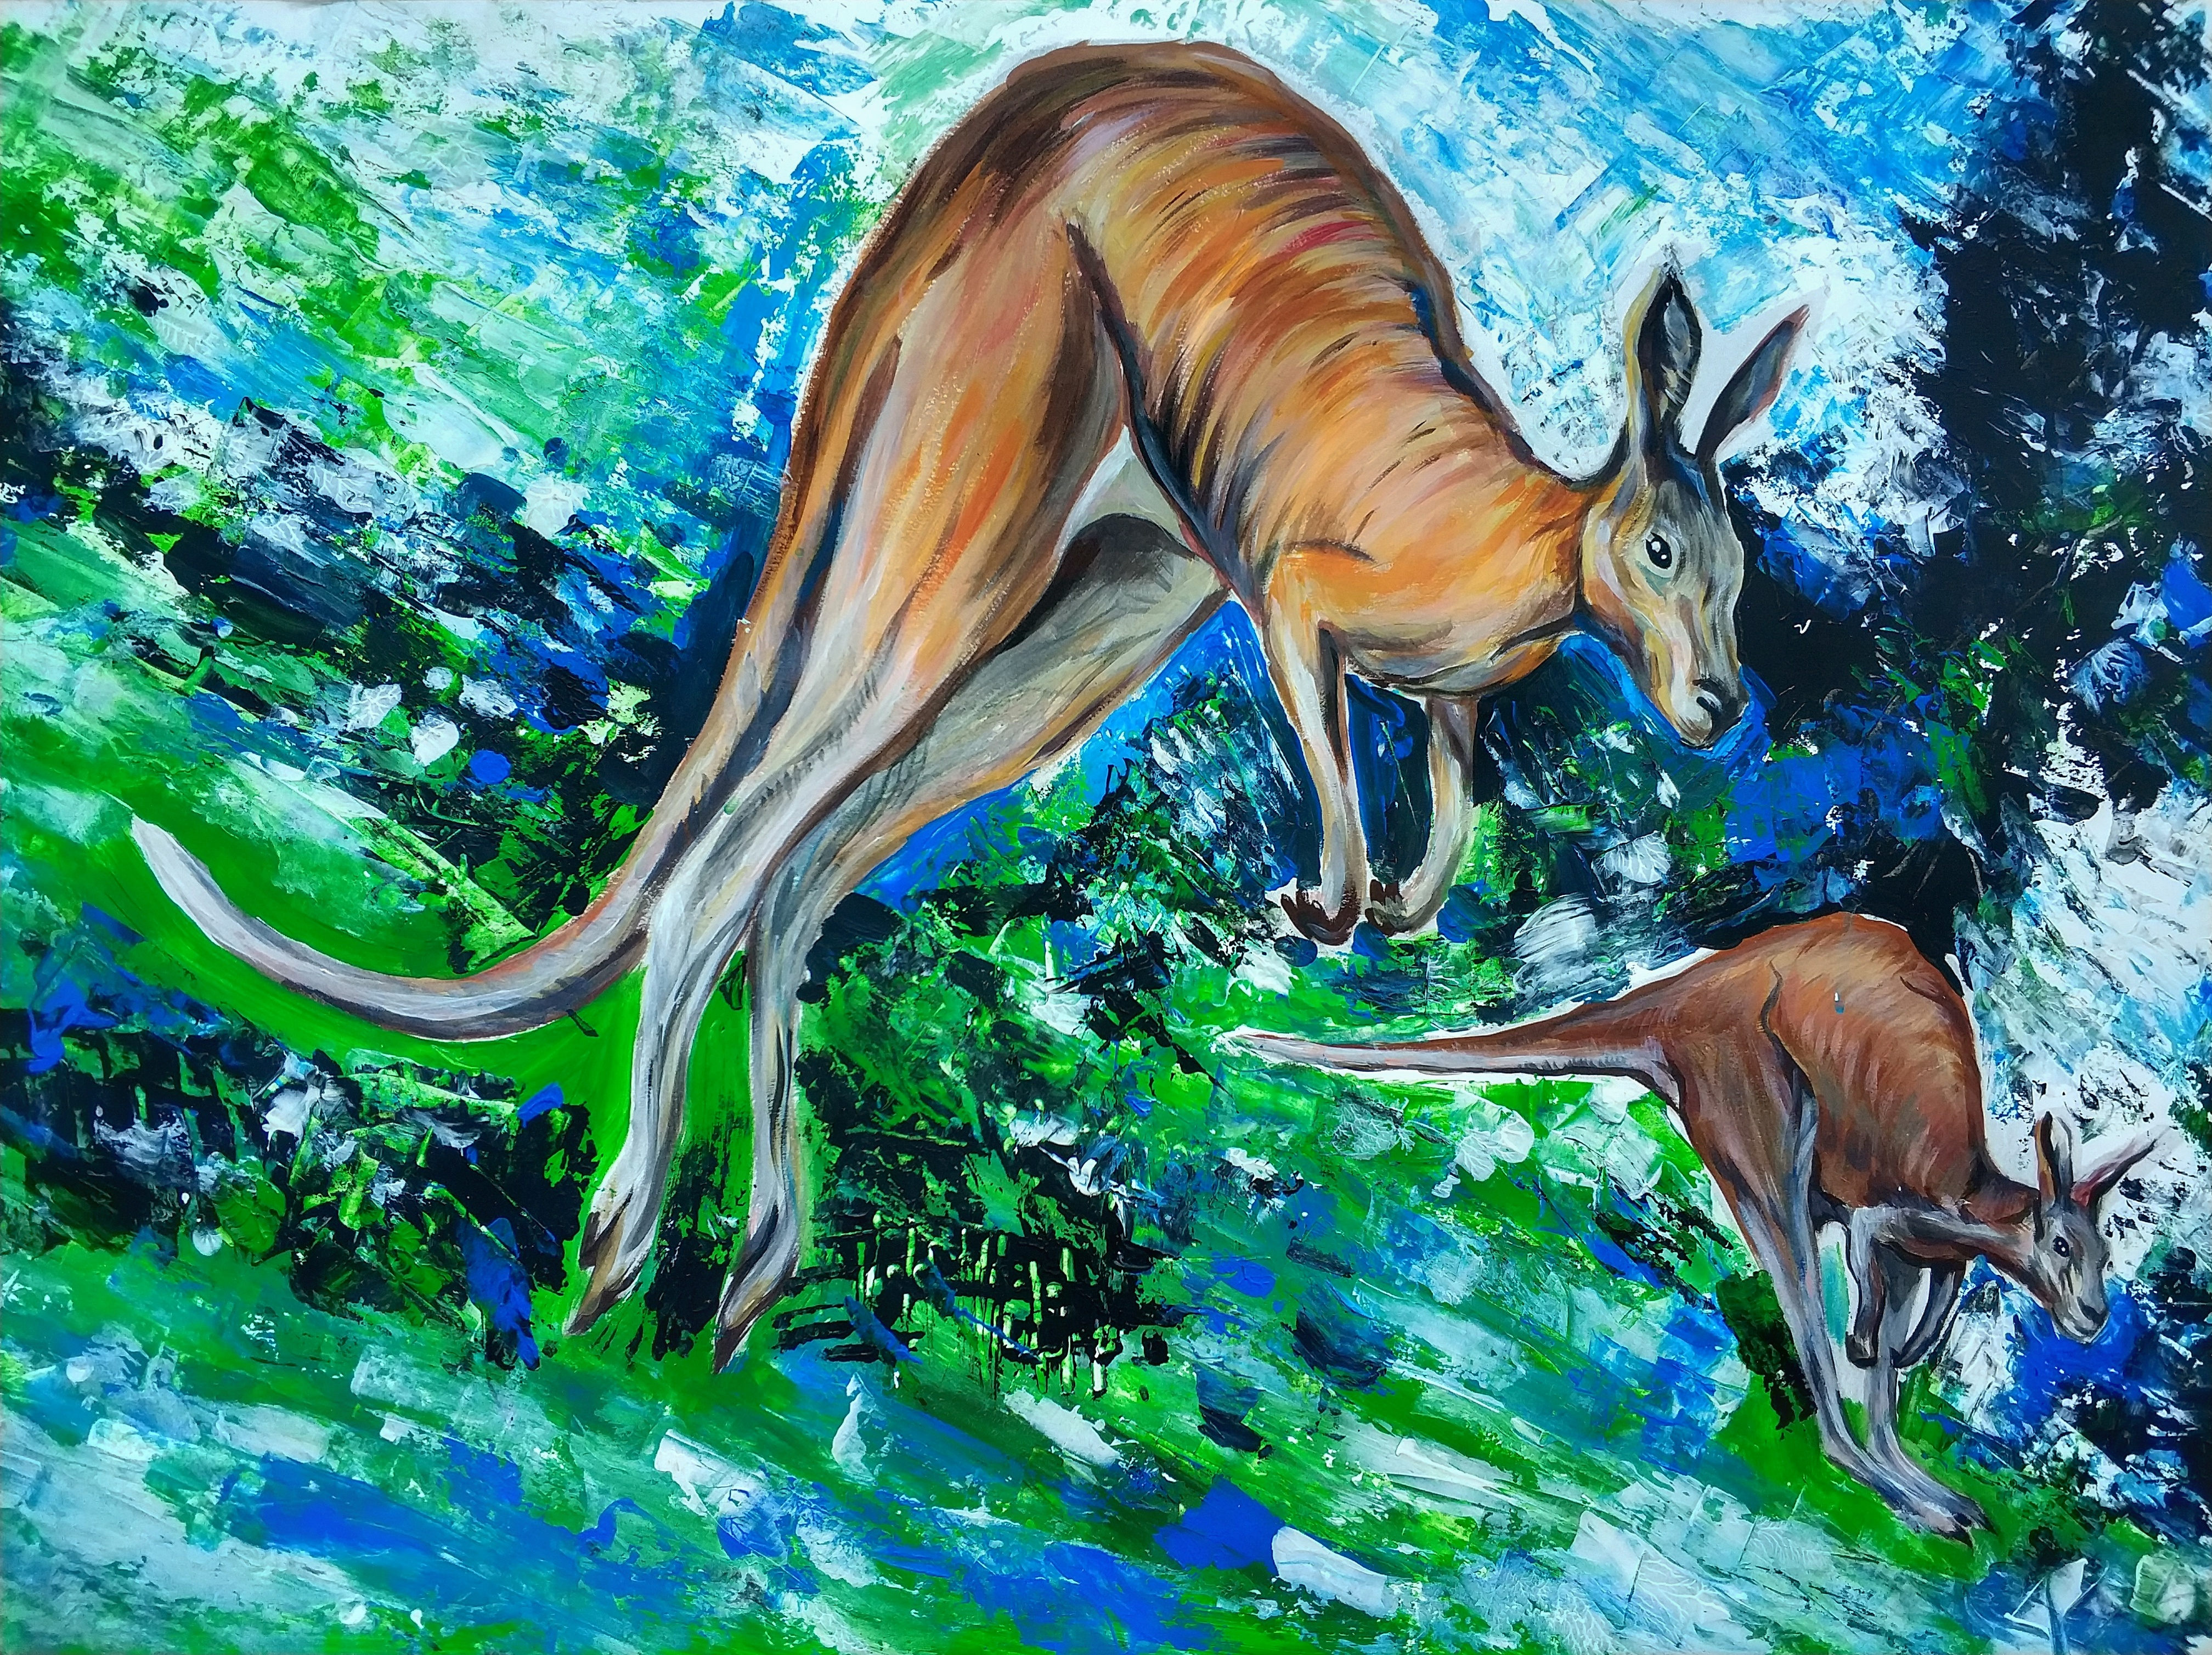 Art for Australia Exhibition